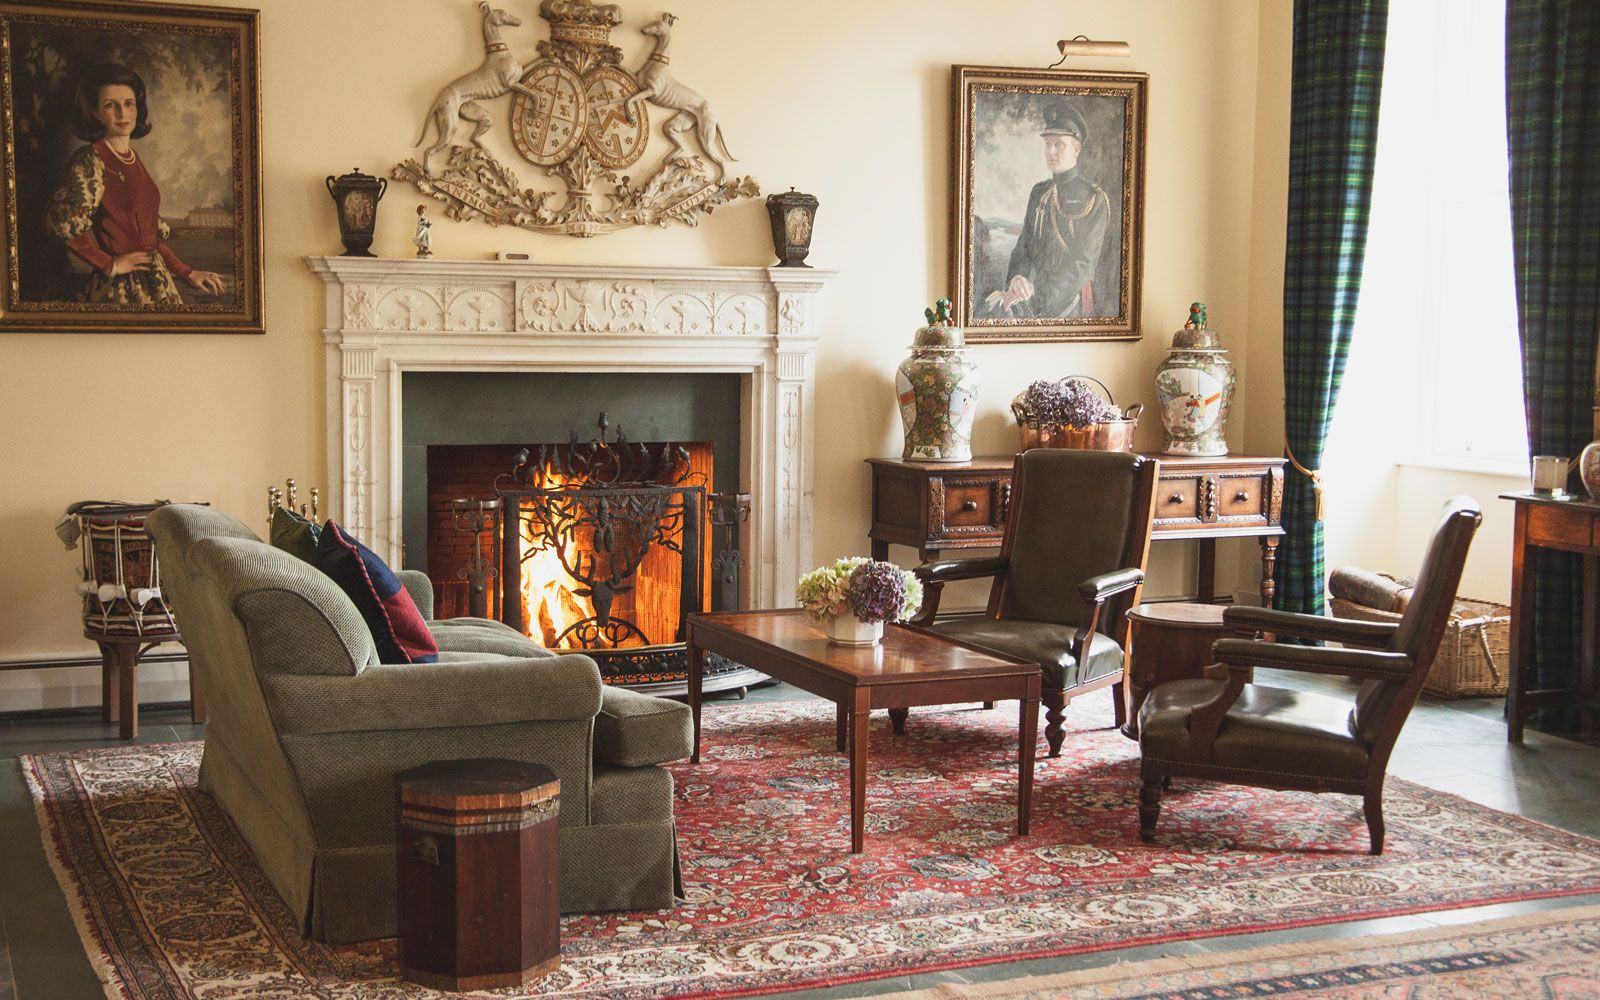 Images Castle hotel, Luxury hotels interior, Luxury